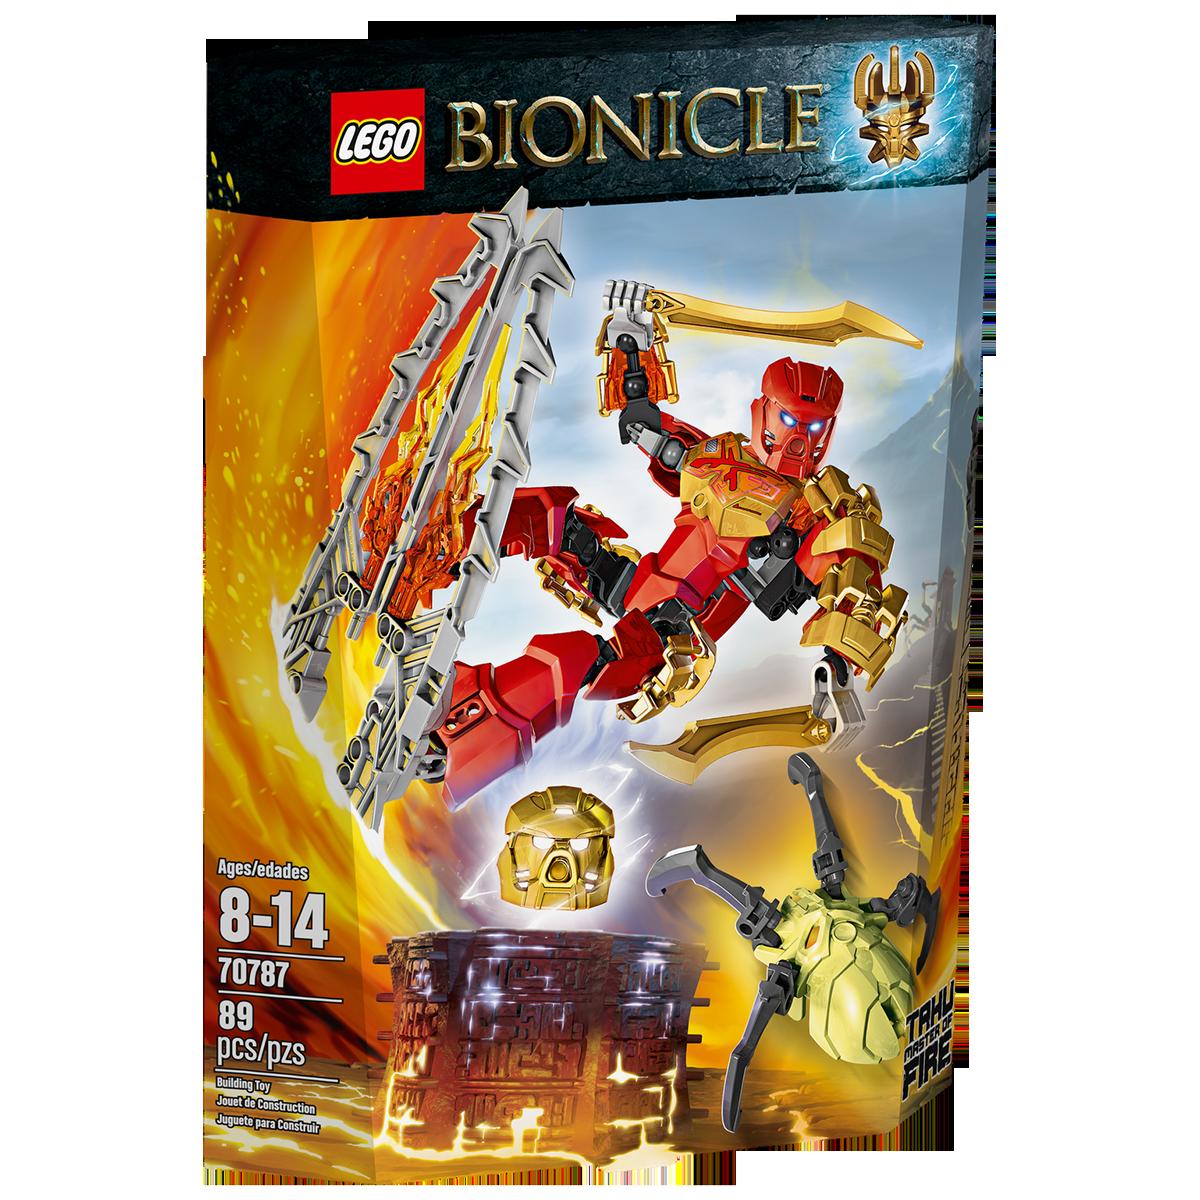 Lego Bionicle 70787 - Thần lửa Tahu